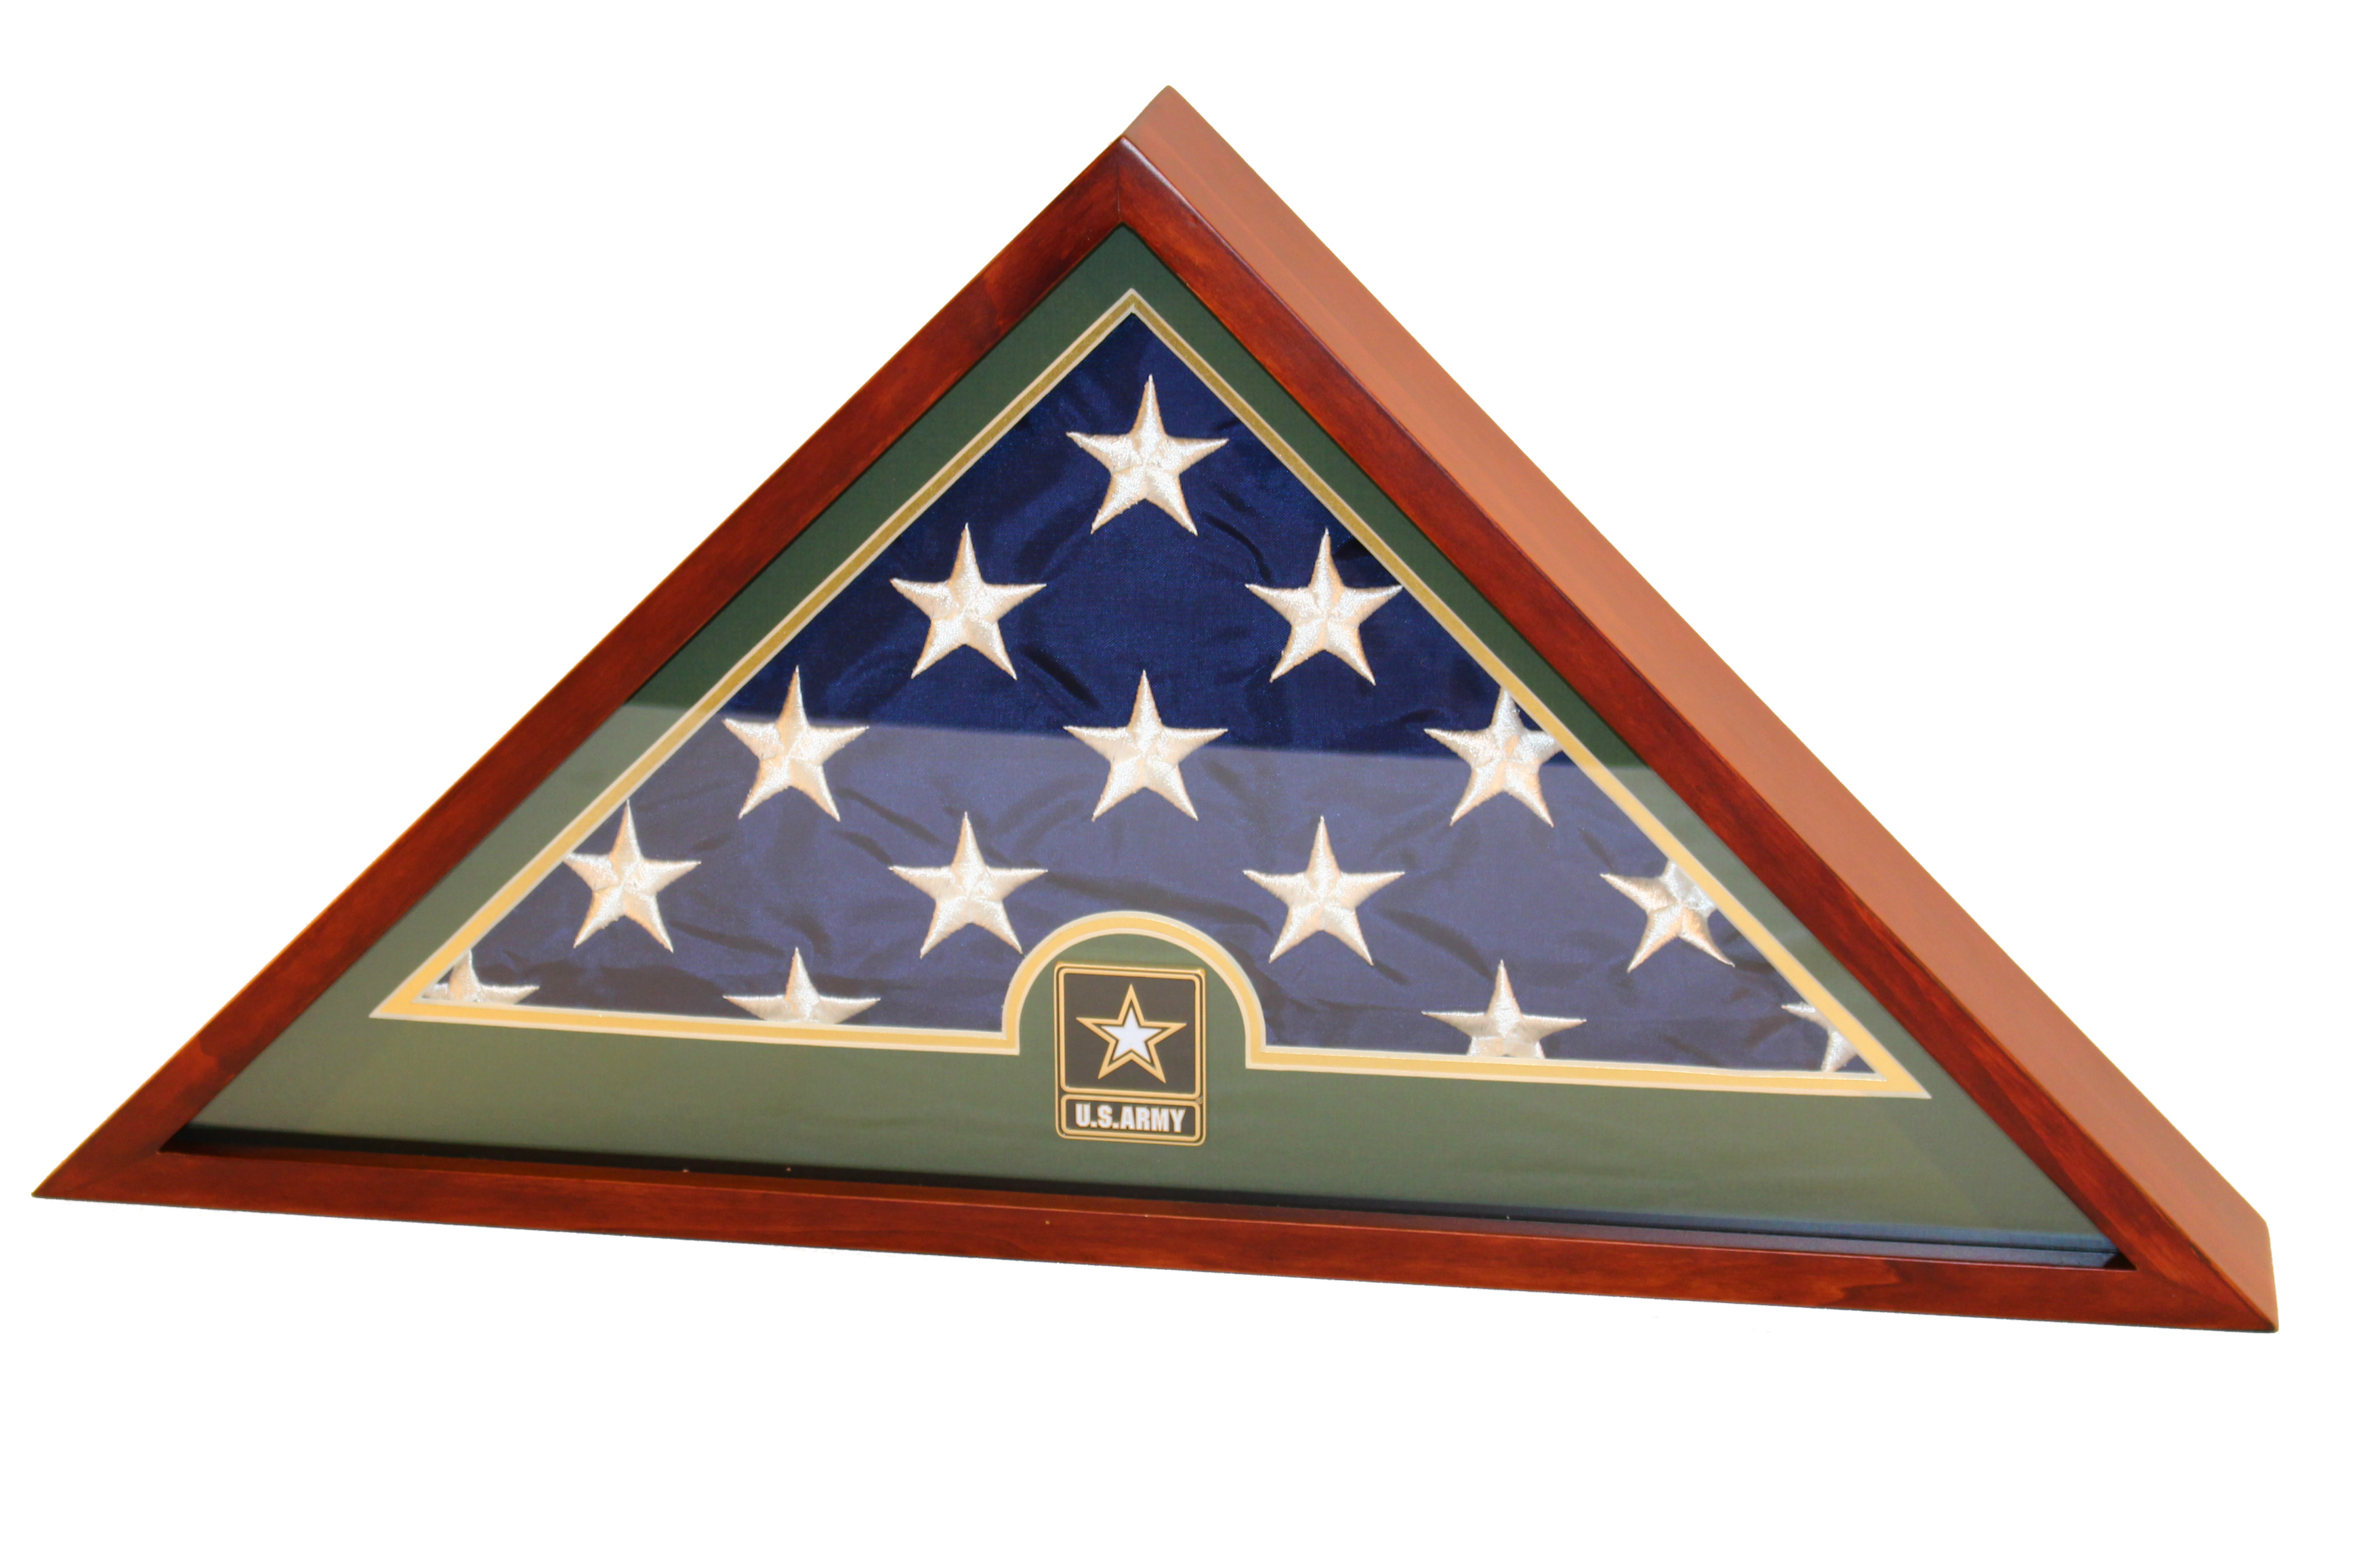 Frames strategic air command aerospace museum flag display case us army new logo medallion jeuxipadfo Images